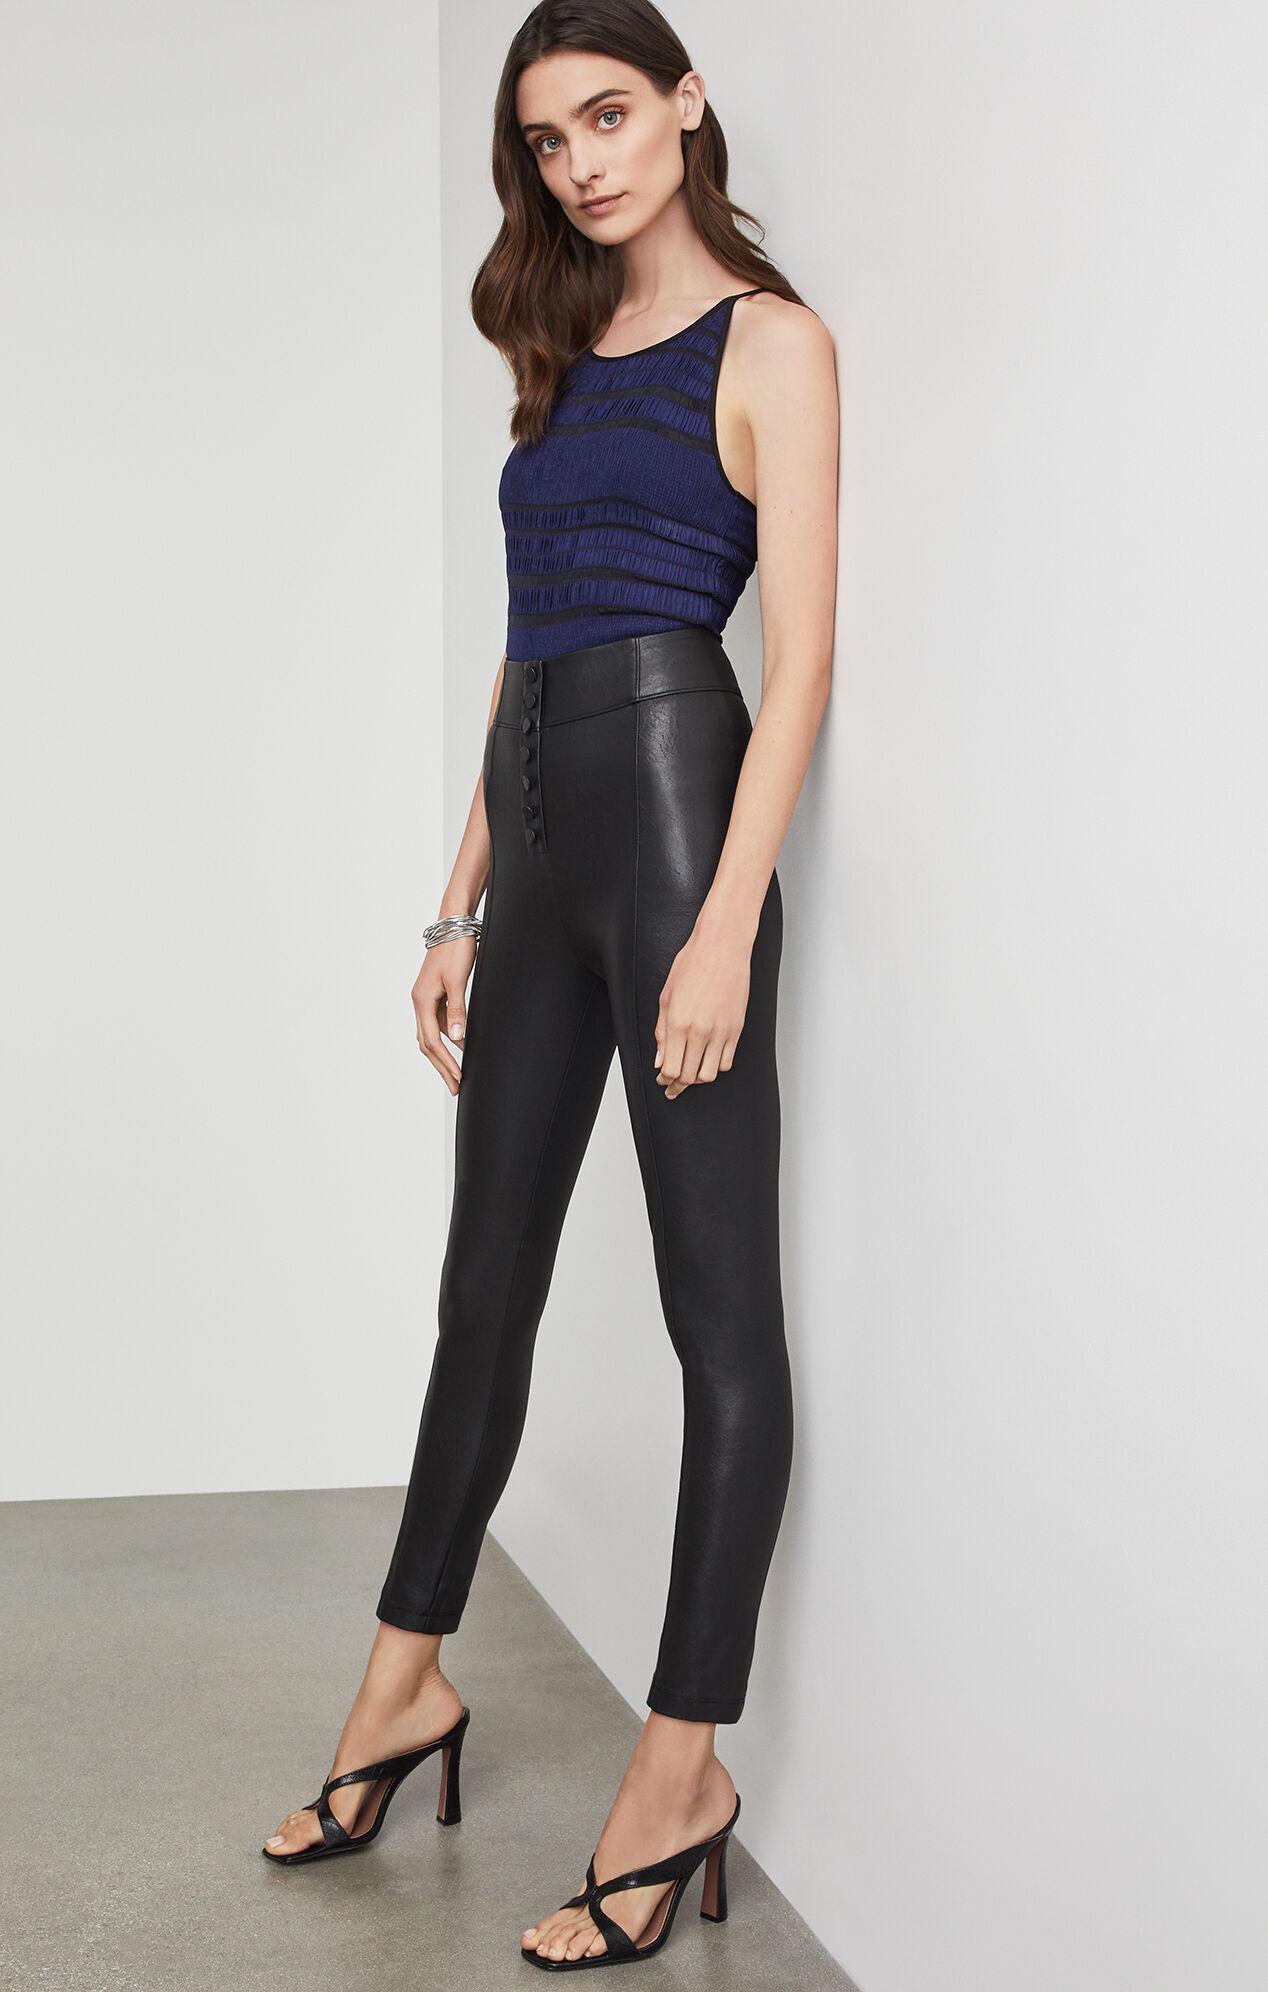 BCBGMAXAZRIA: Button Front Faux Leather Legging